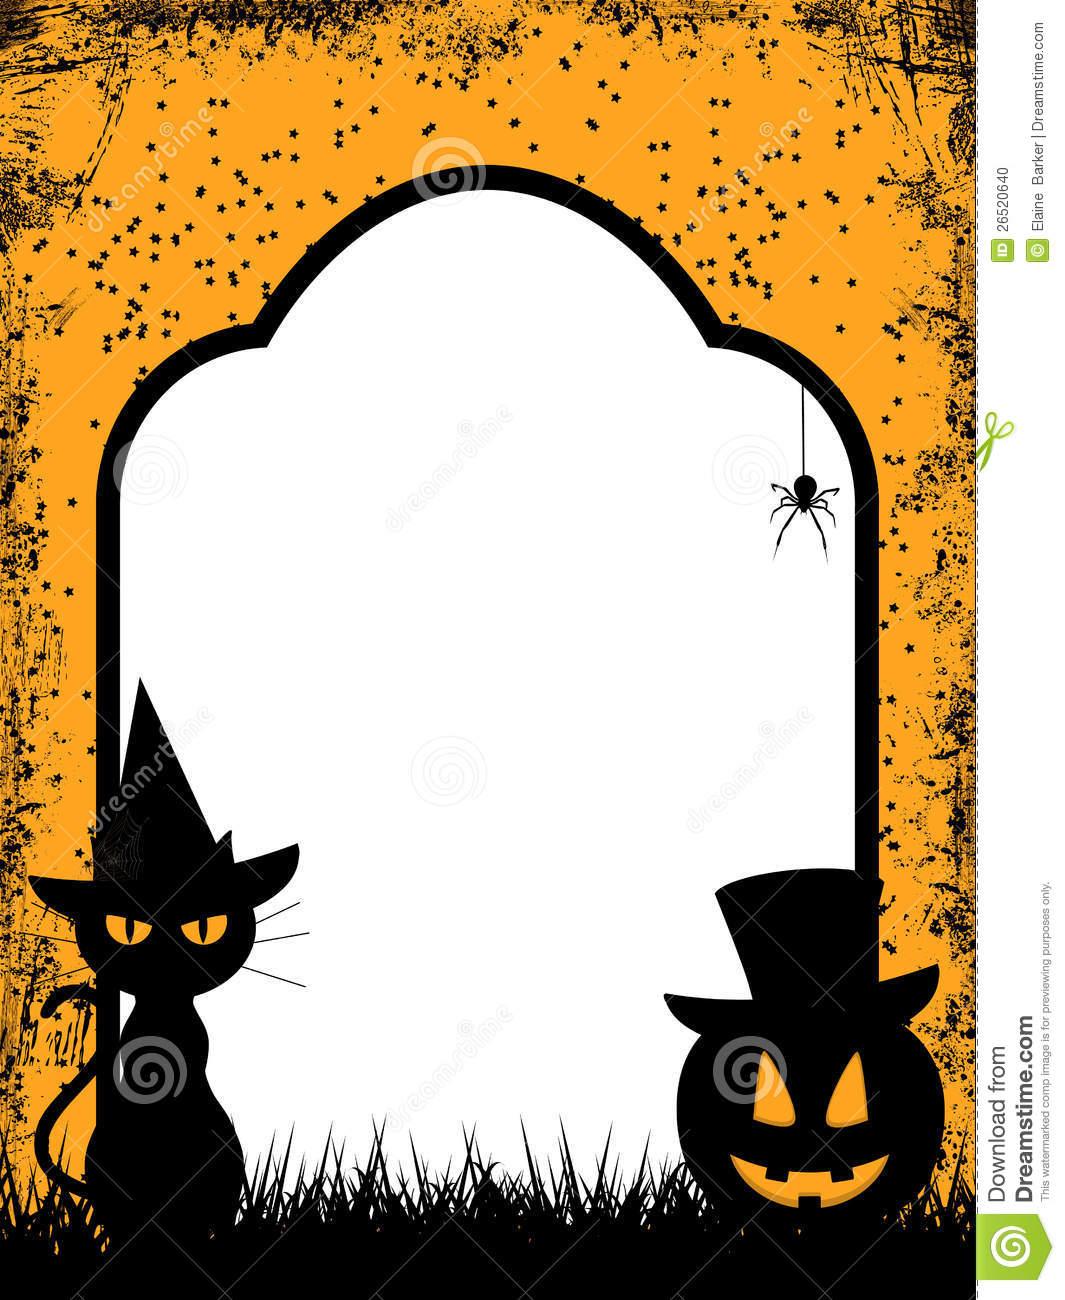 Border Clipart Halloween Border Clipart Halloween Border Clipart